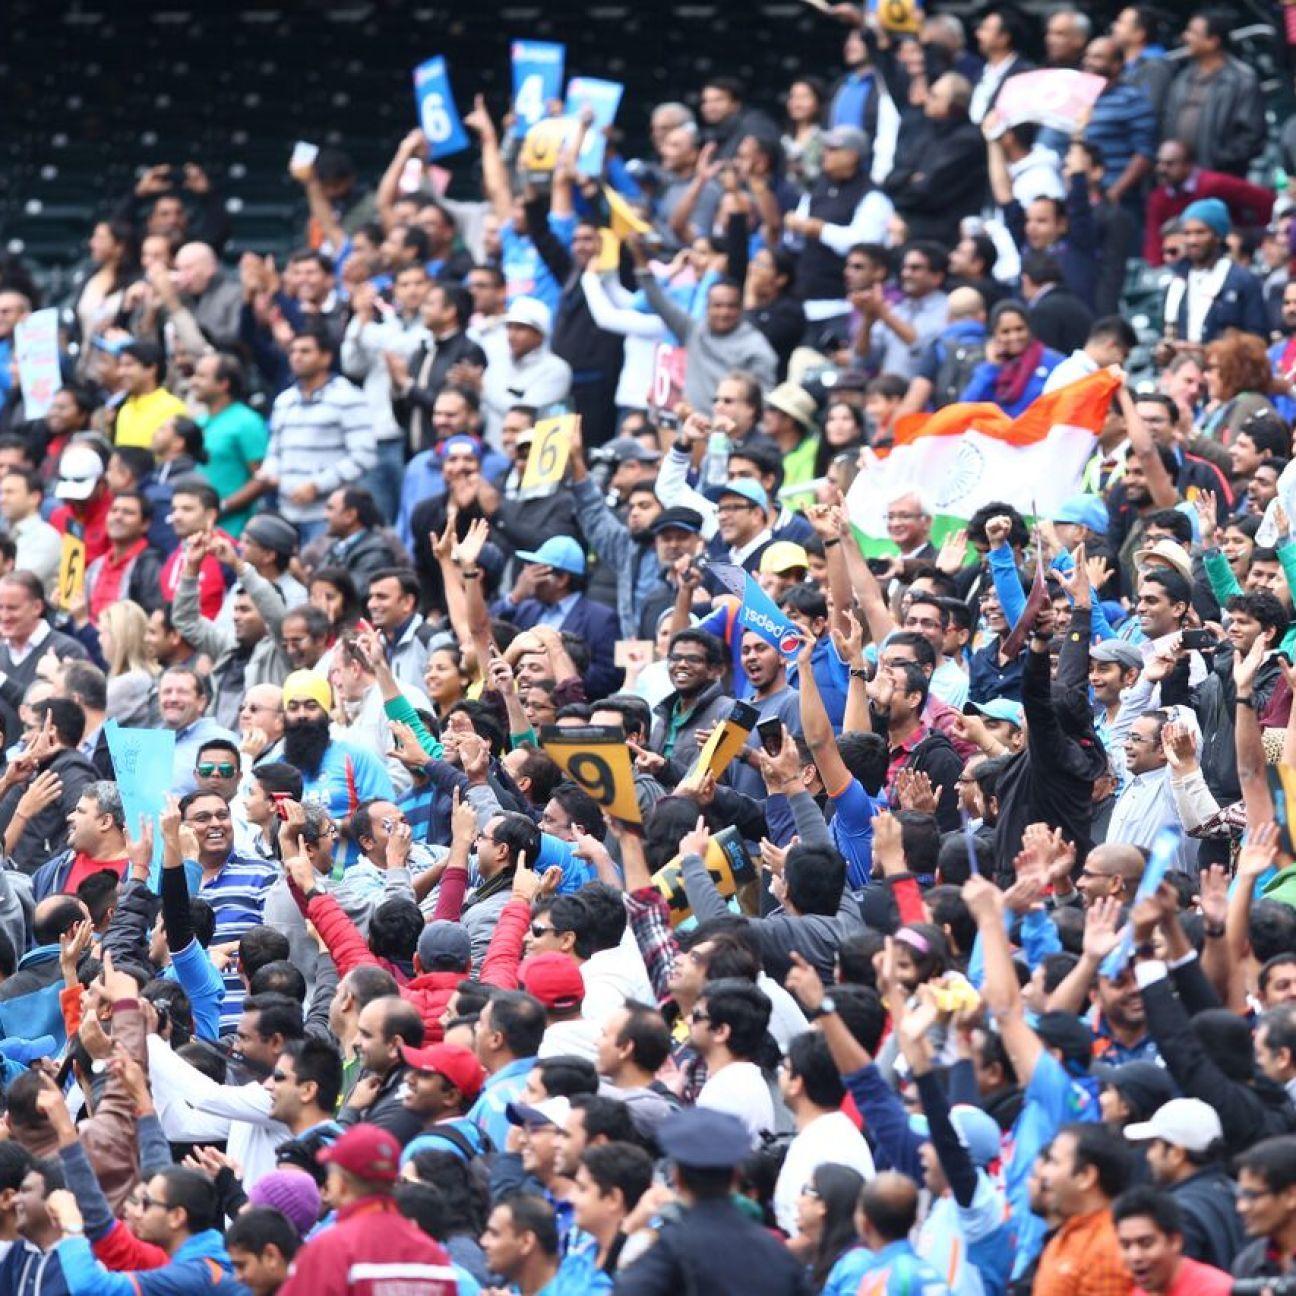 USA Cricket receives $1 billion boost to develop T20 league